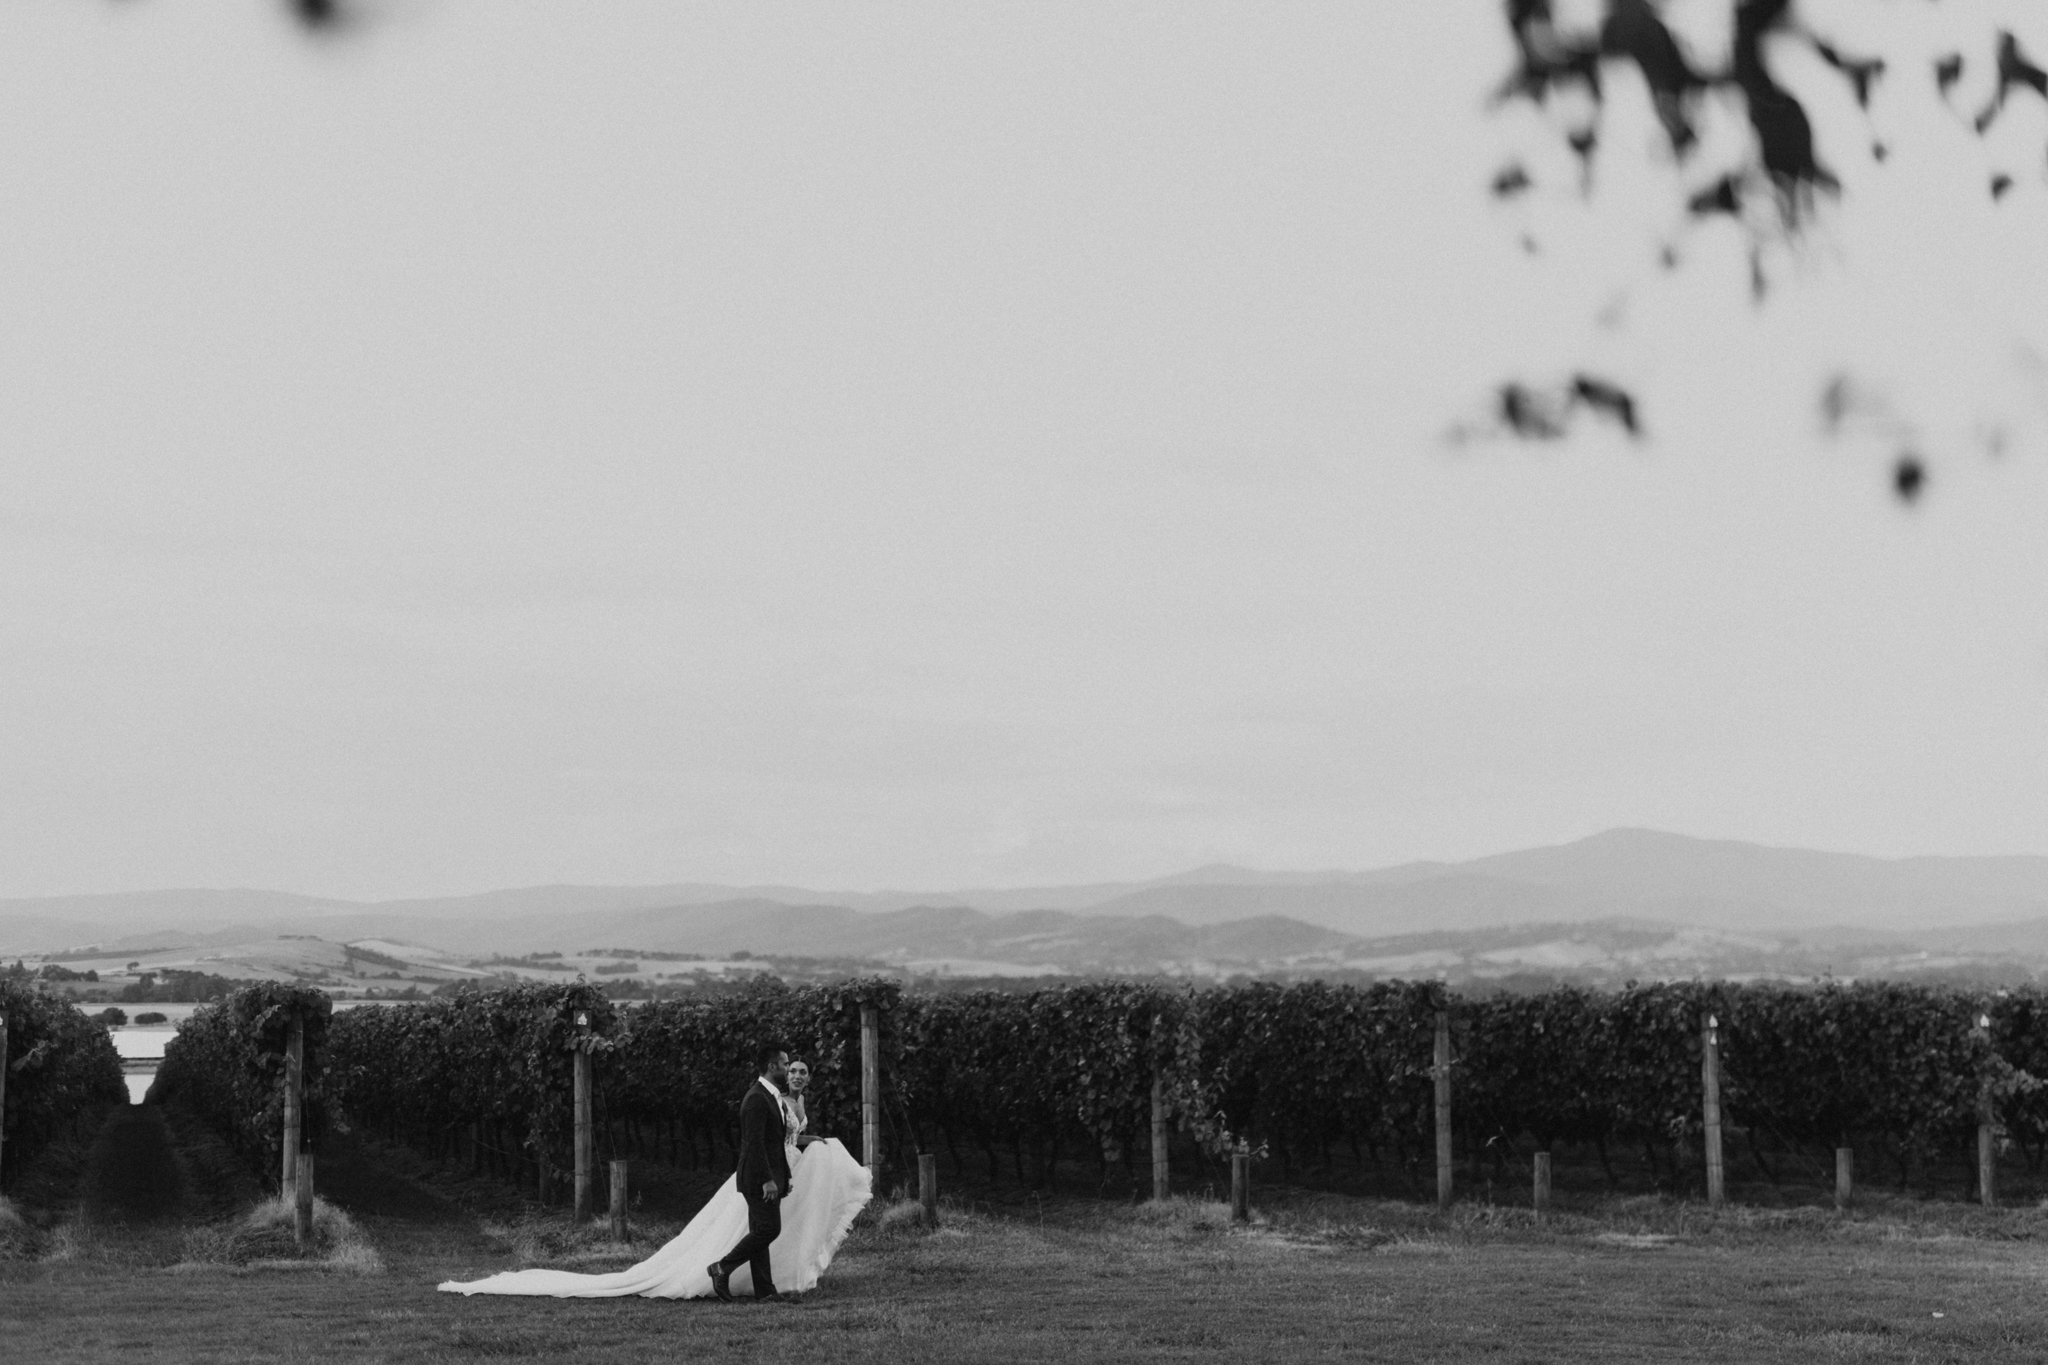 The-Stones-of-Yarra-Valley-Wedding-EmotionsandMathPhotography-234.jpg